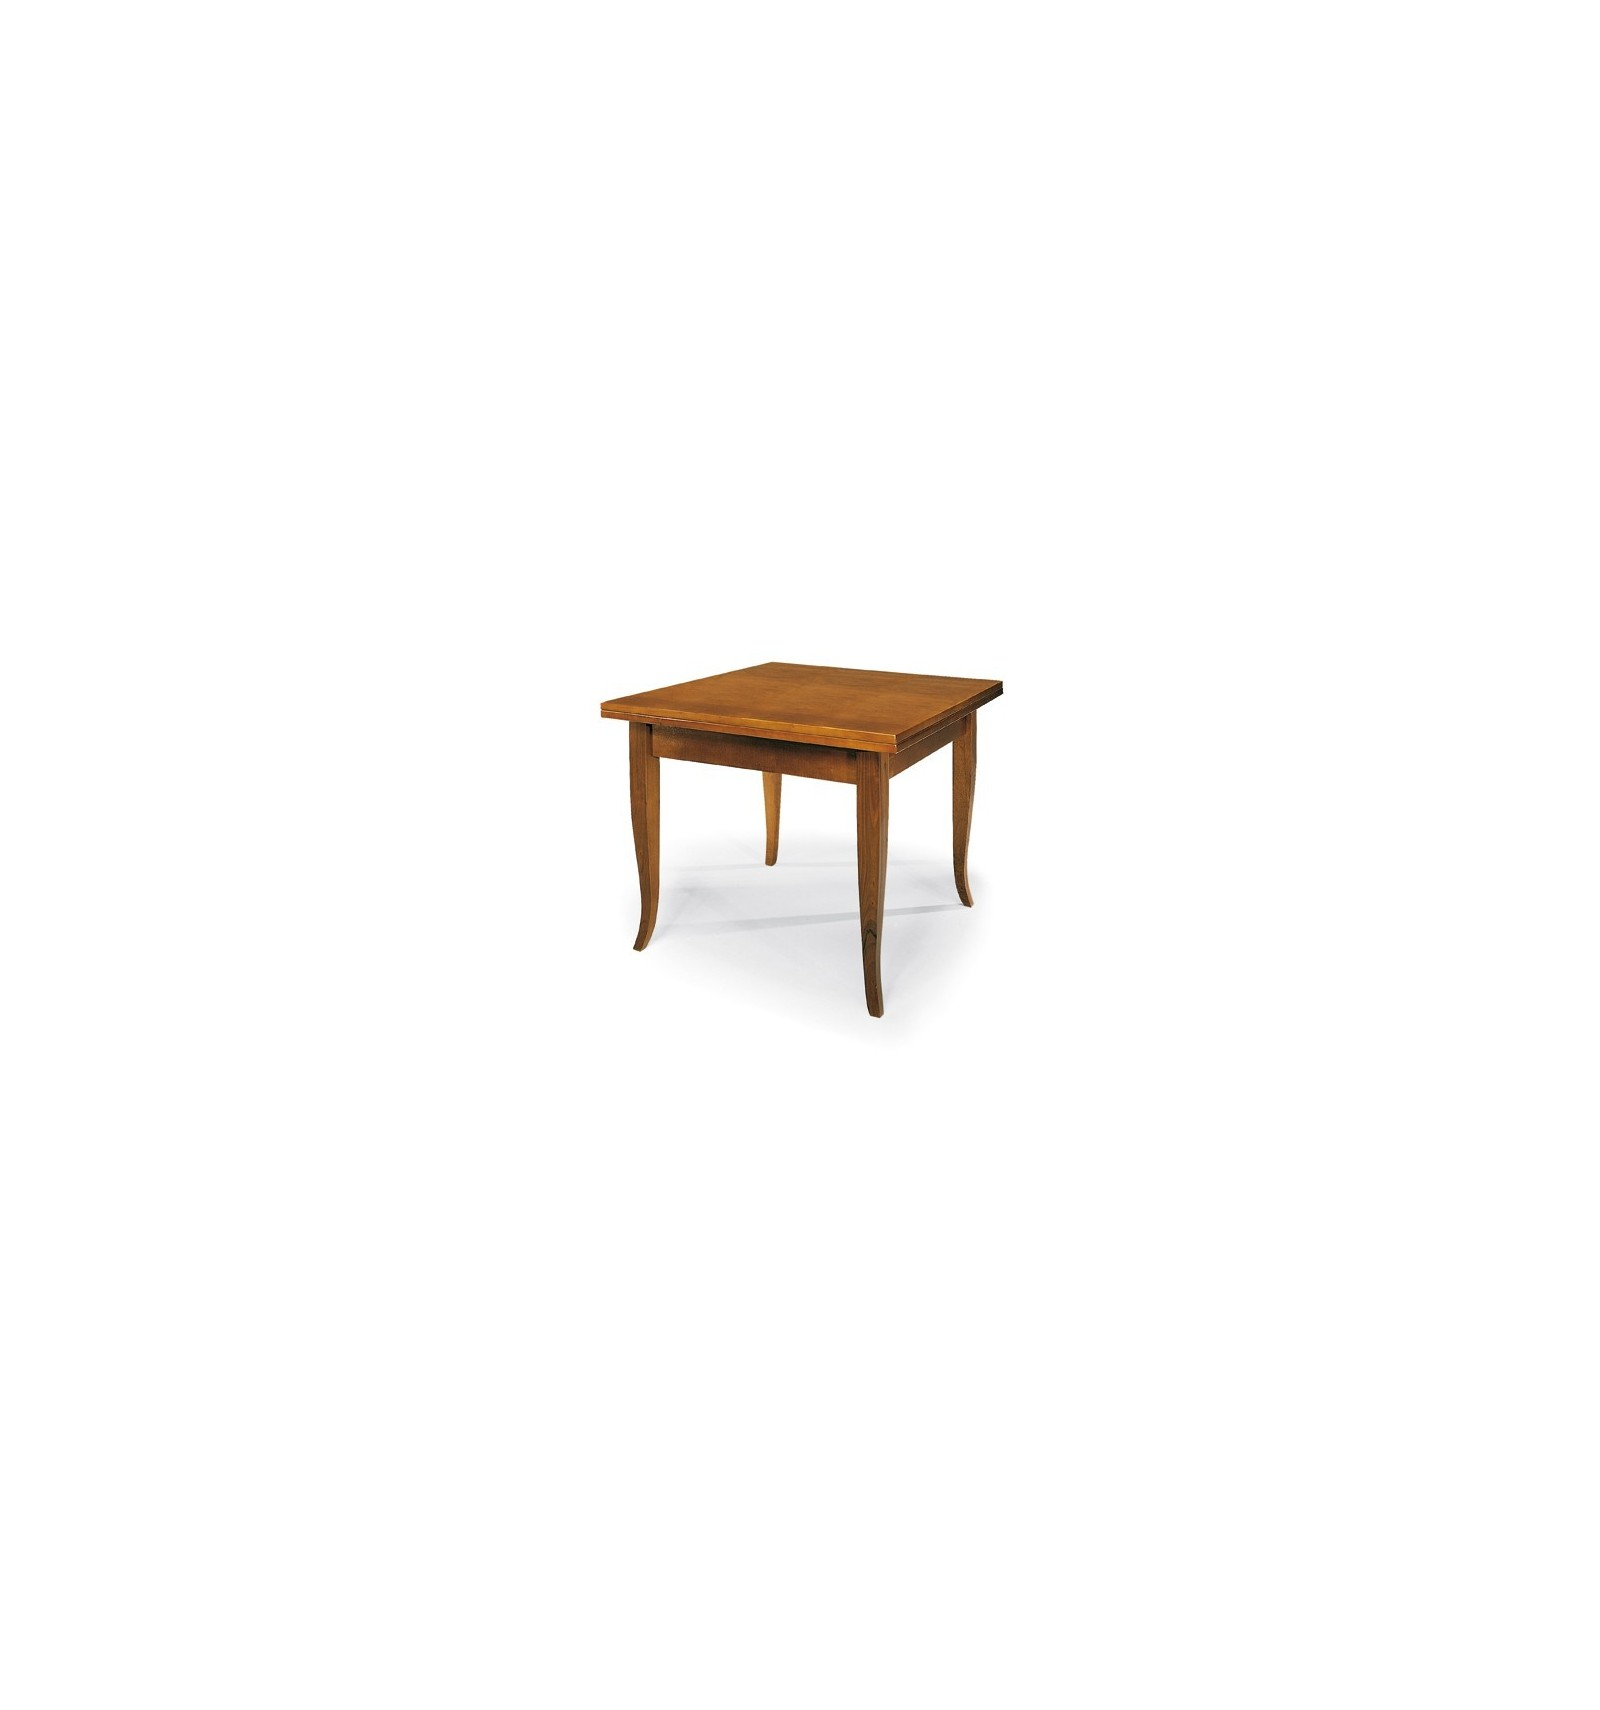 Tavolo Quadrato Allungabile Libro.Tavolo Quadrato Allungabile A Libro Classico 100 200 W140 Nc Lo